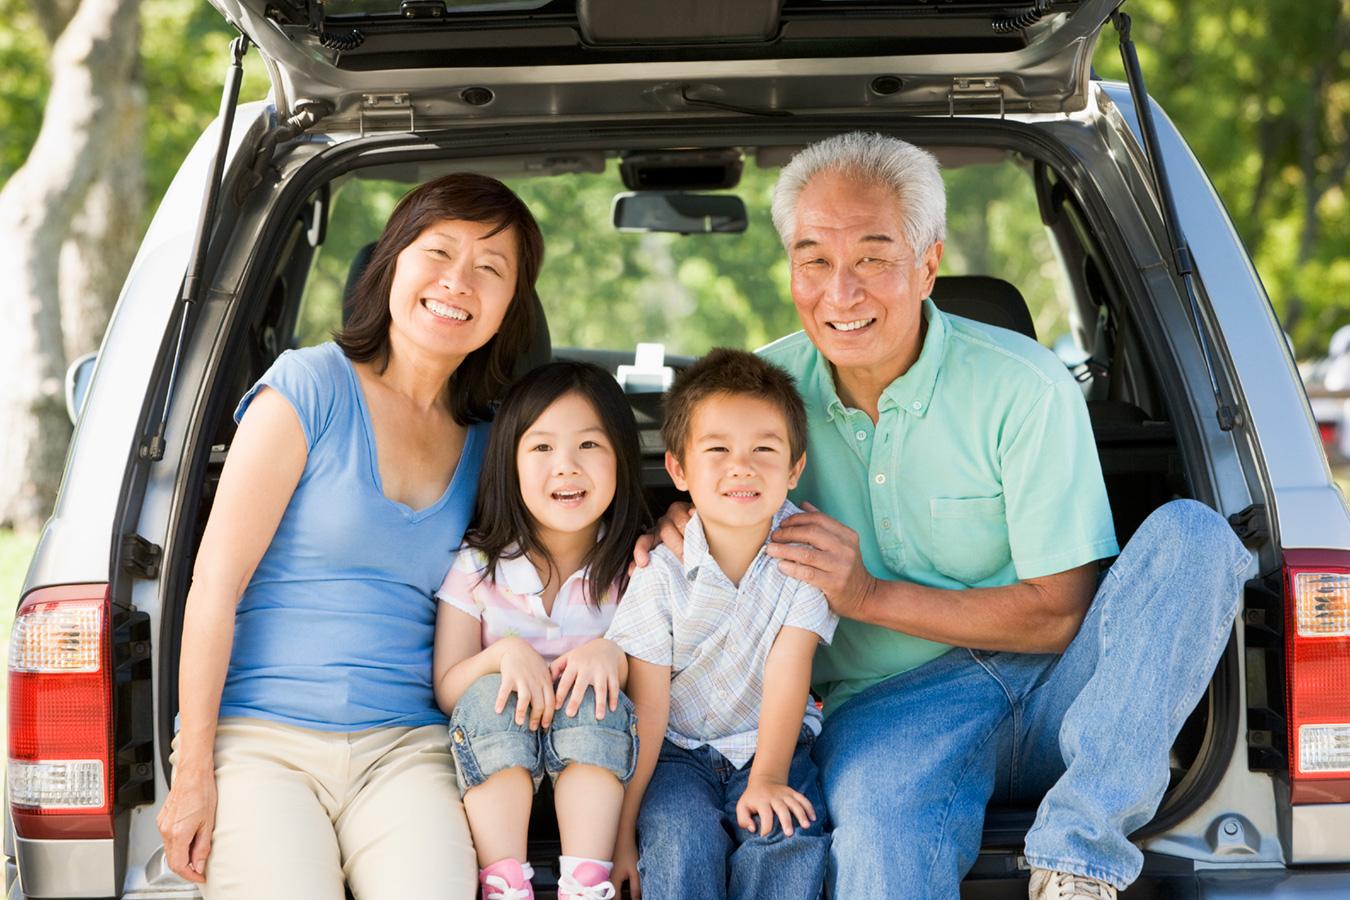 family insurance solution daiju yamaguchi yoshino in san diego, california